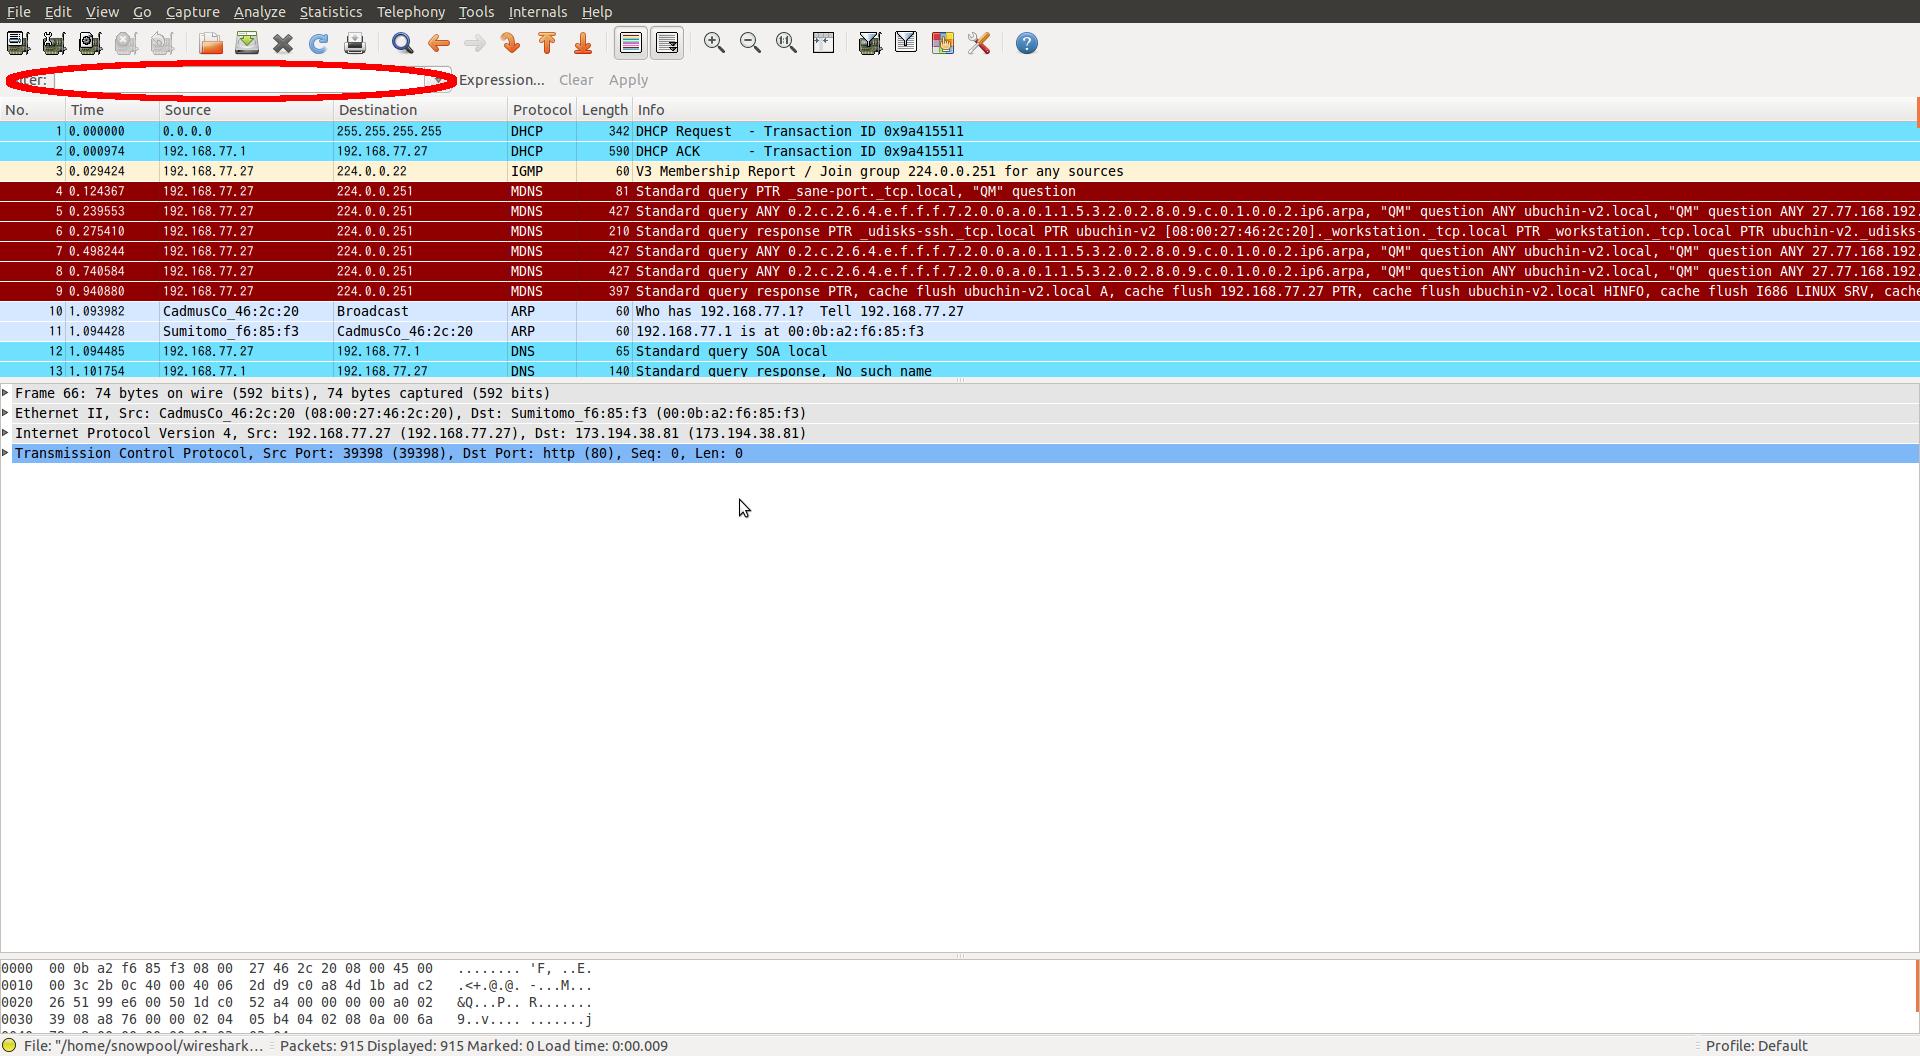 Screenshot-2012-04-17 21:11:46